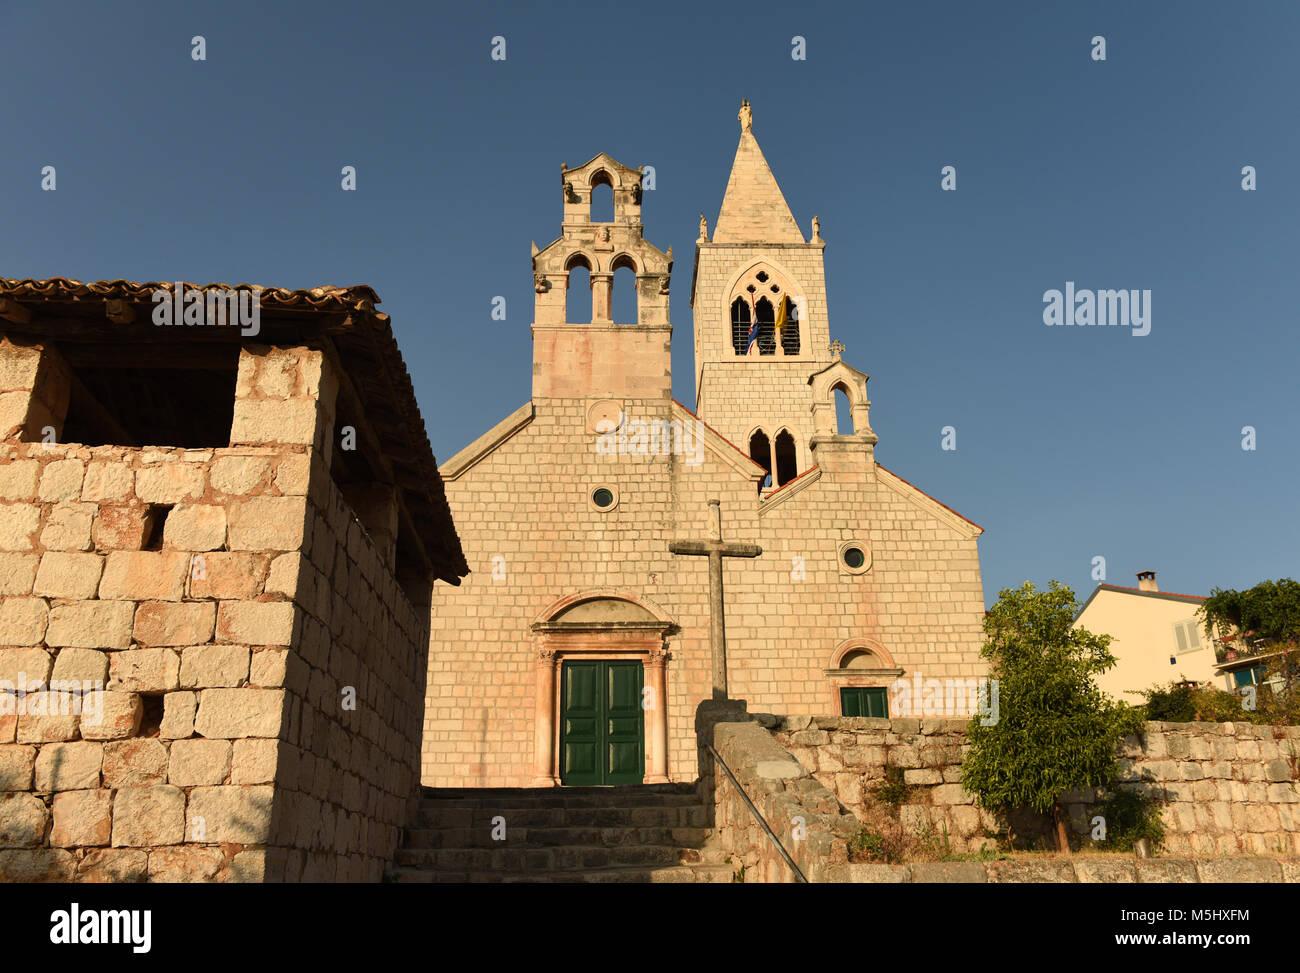 The church of Saint Kosmas and Damian in Lastovo town on  island of Lastovo, Croatia - Stock Image